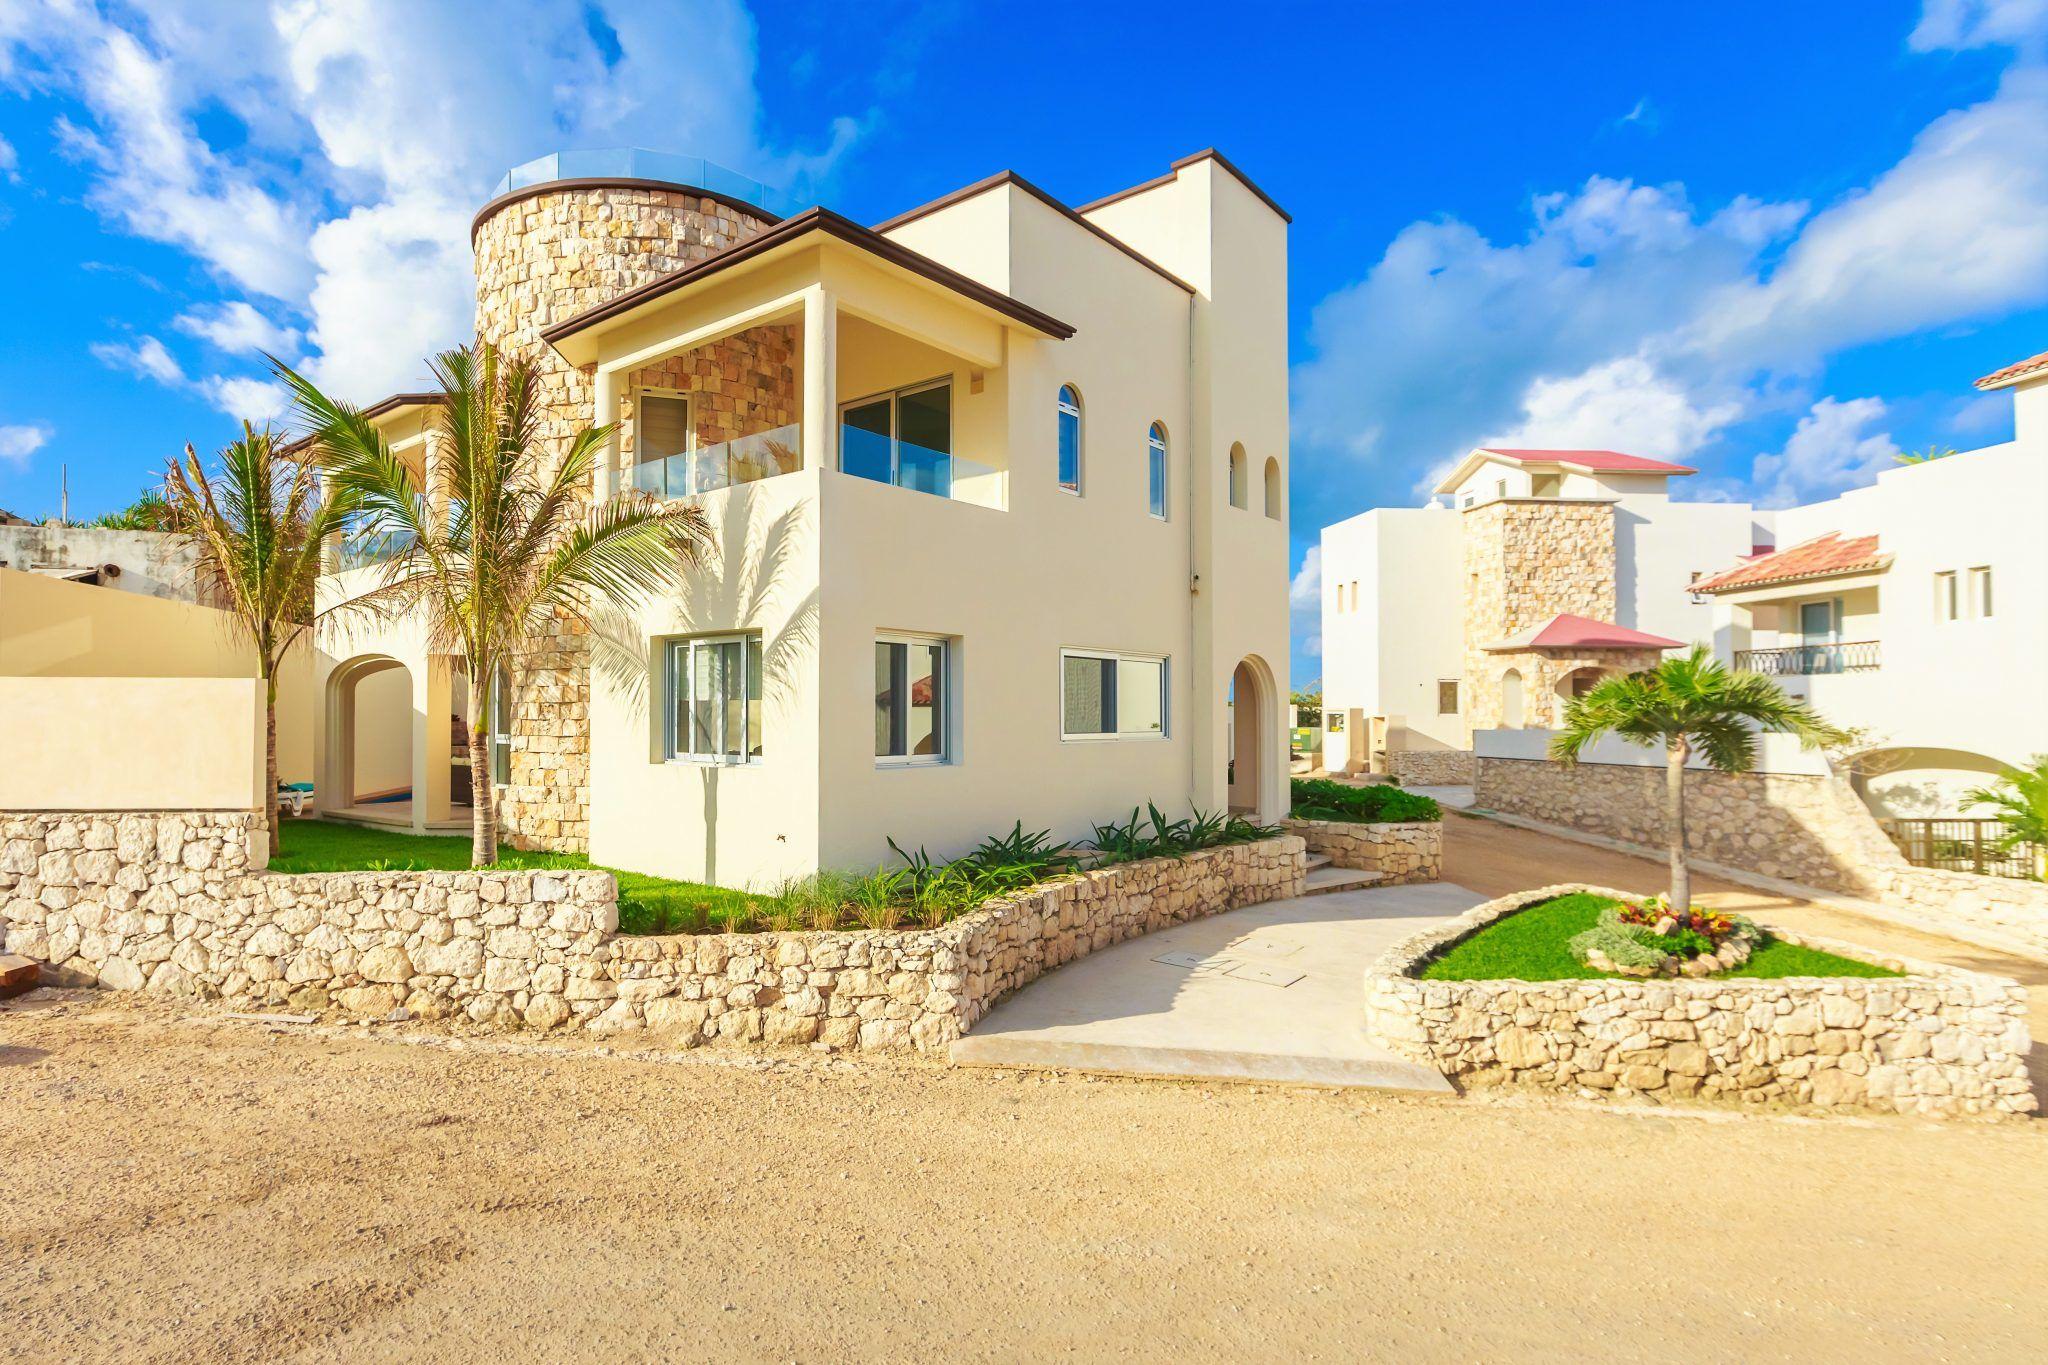 Isla Mujeres Vacation Rental Casa Elegante Luxury Home